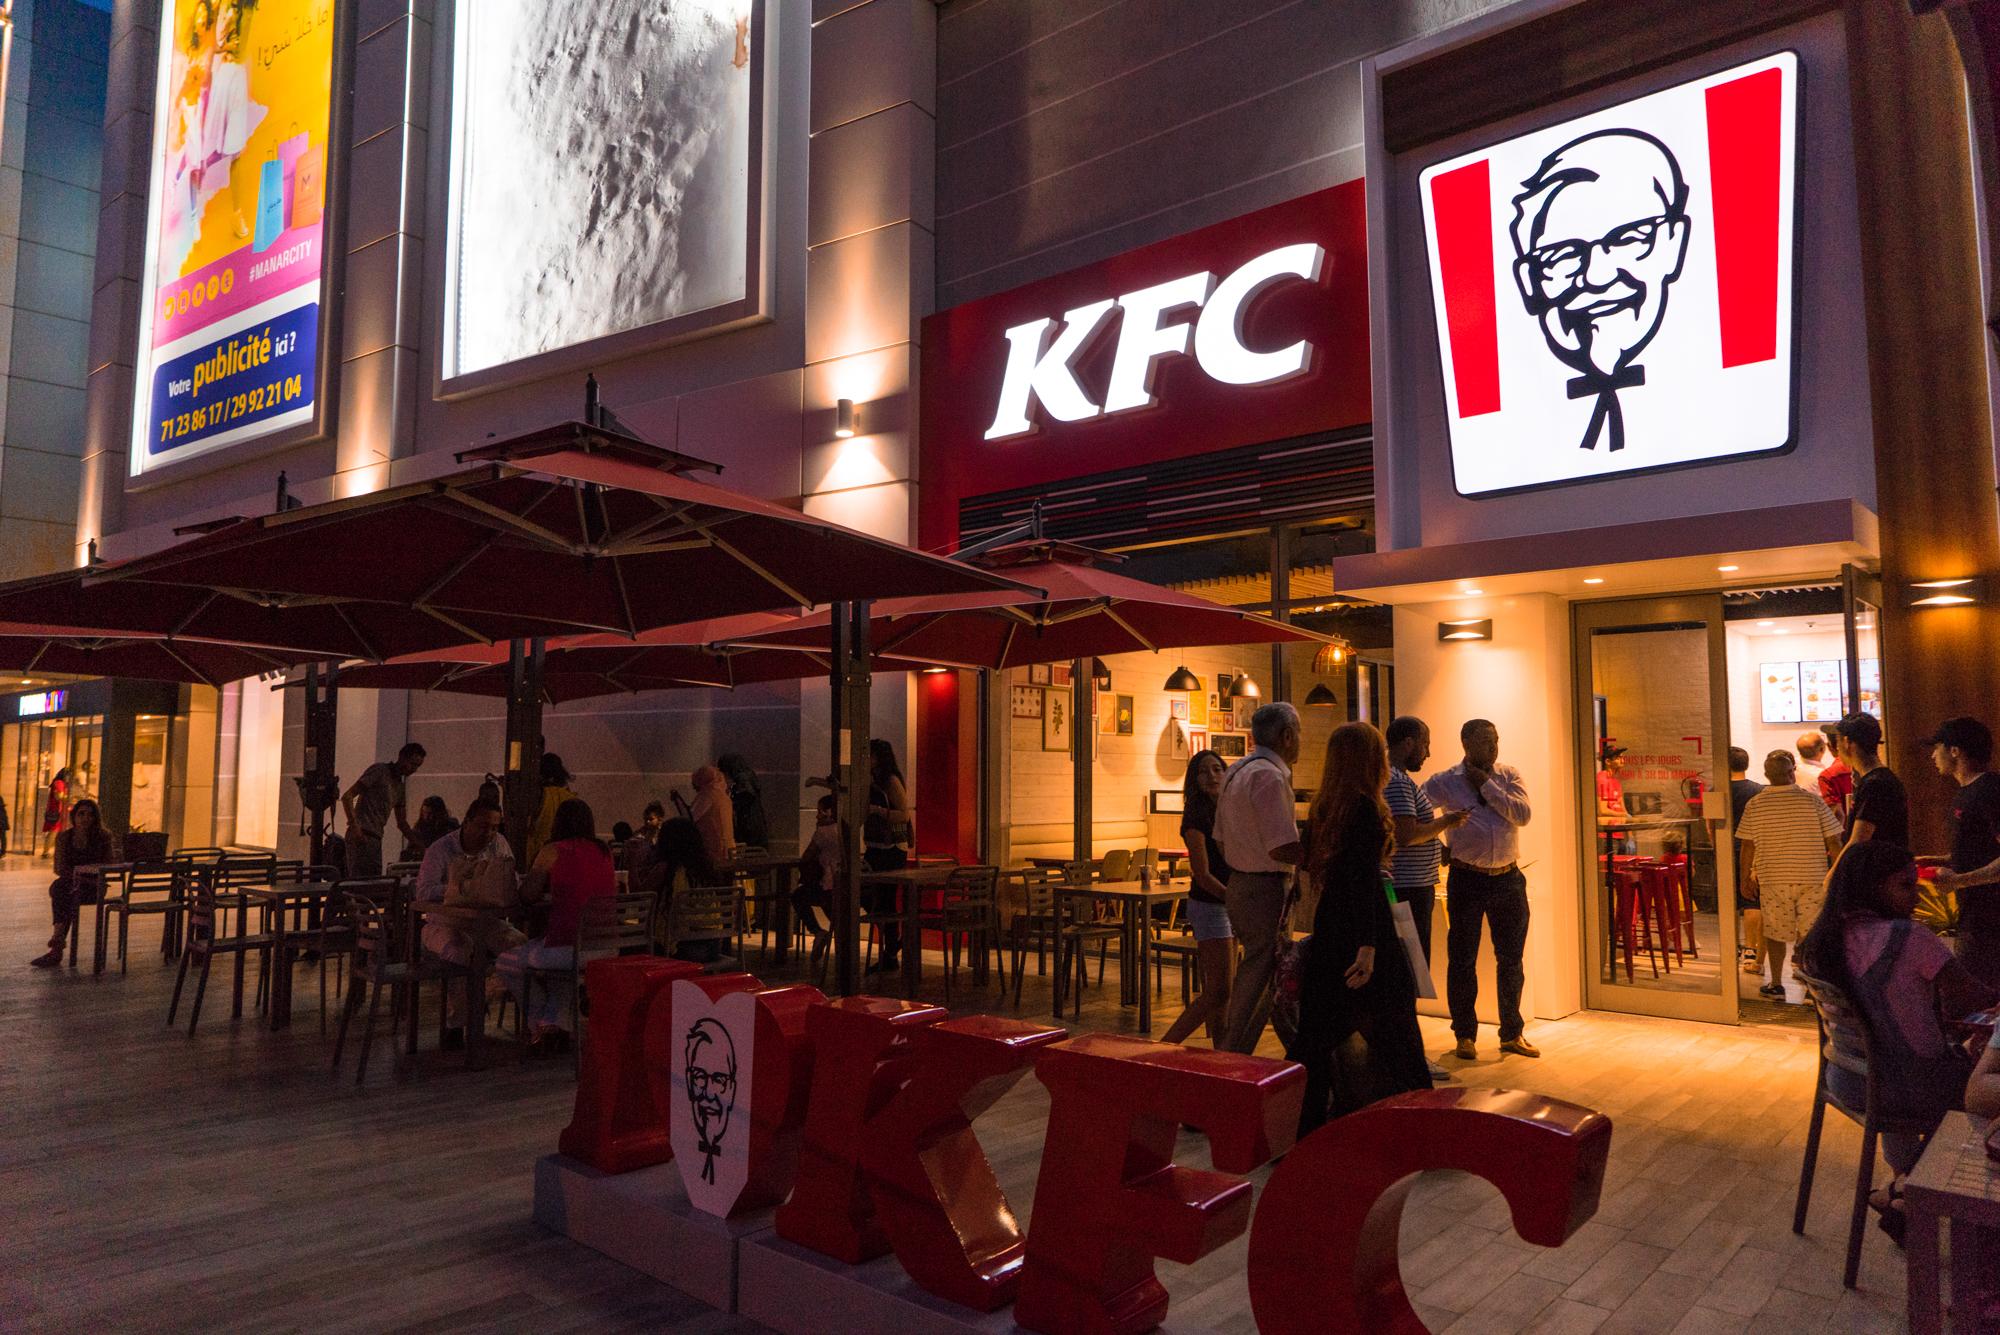 KFC Manar city